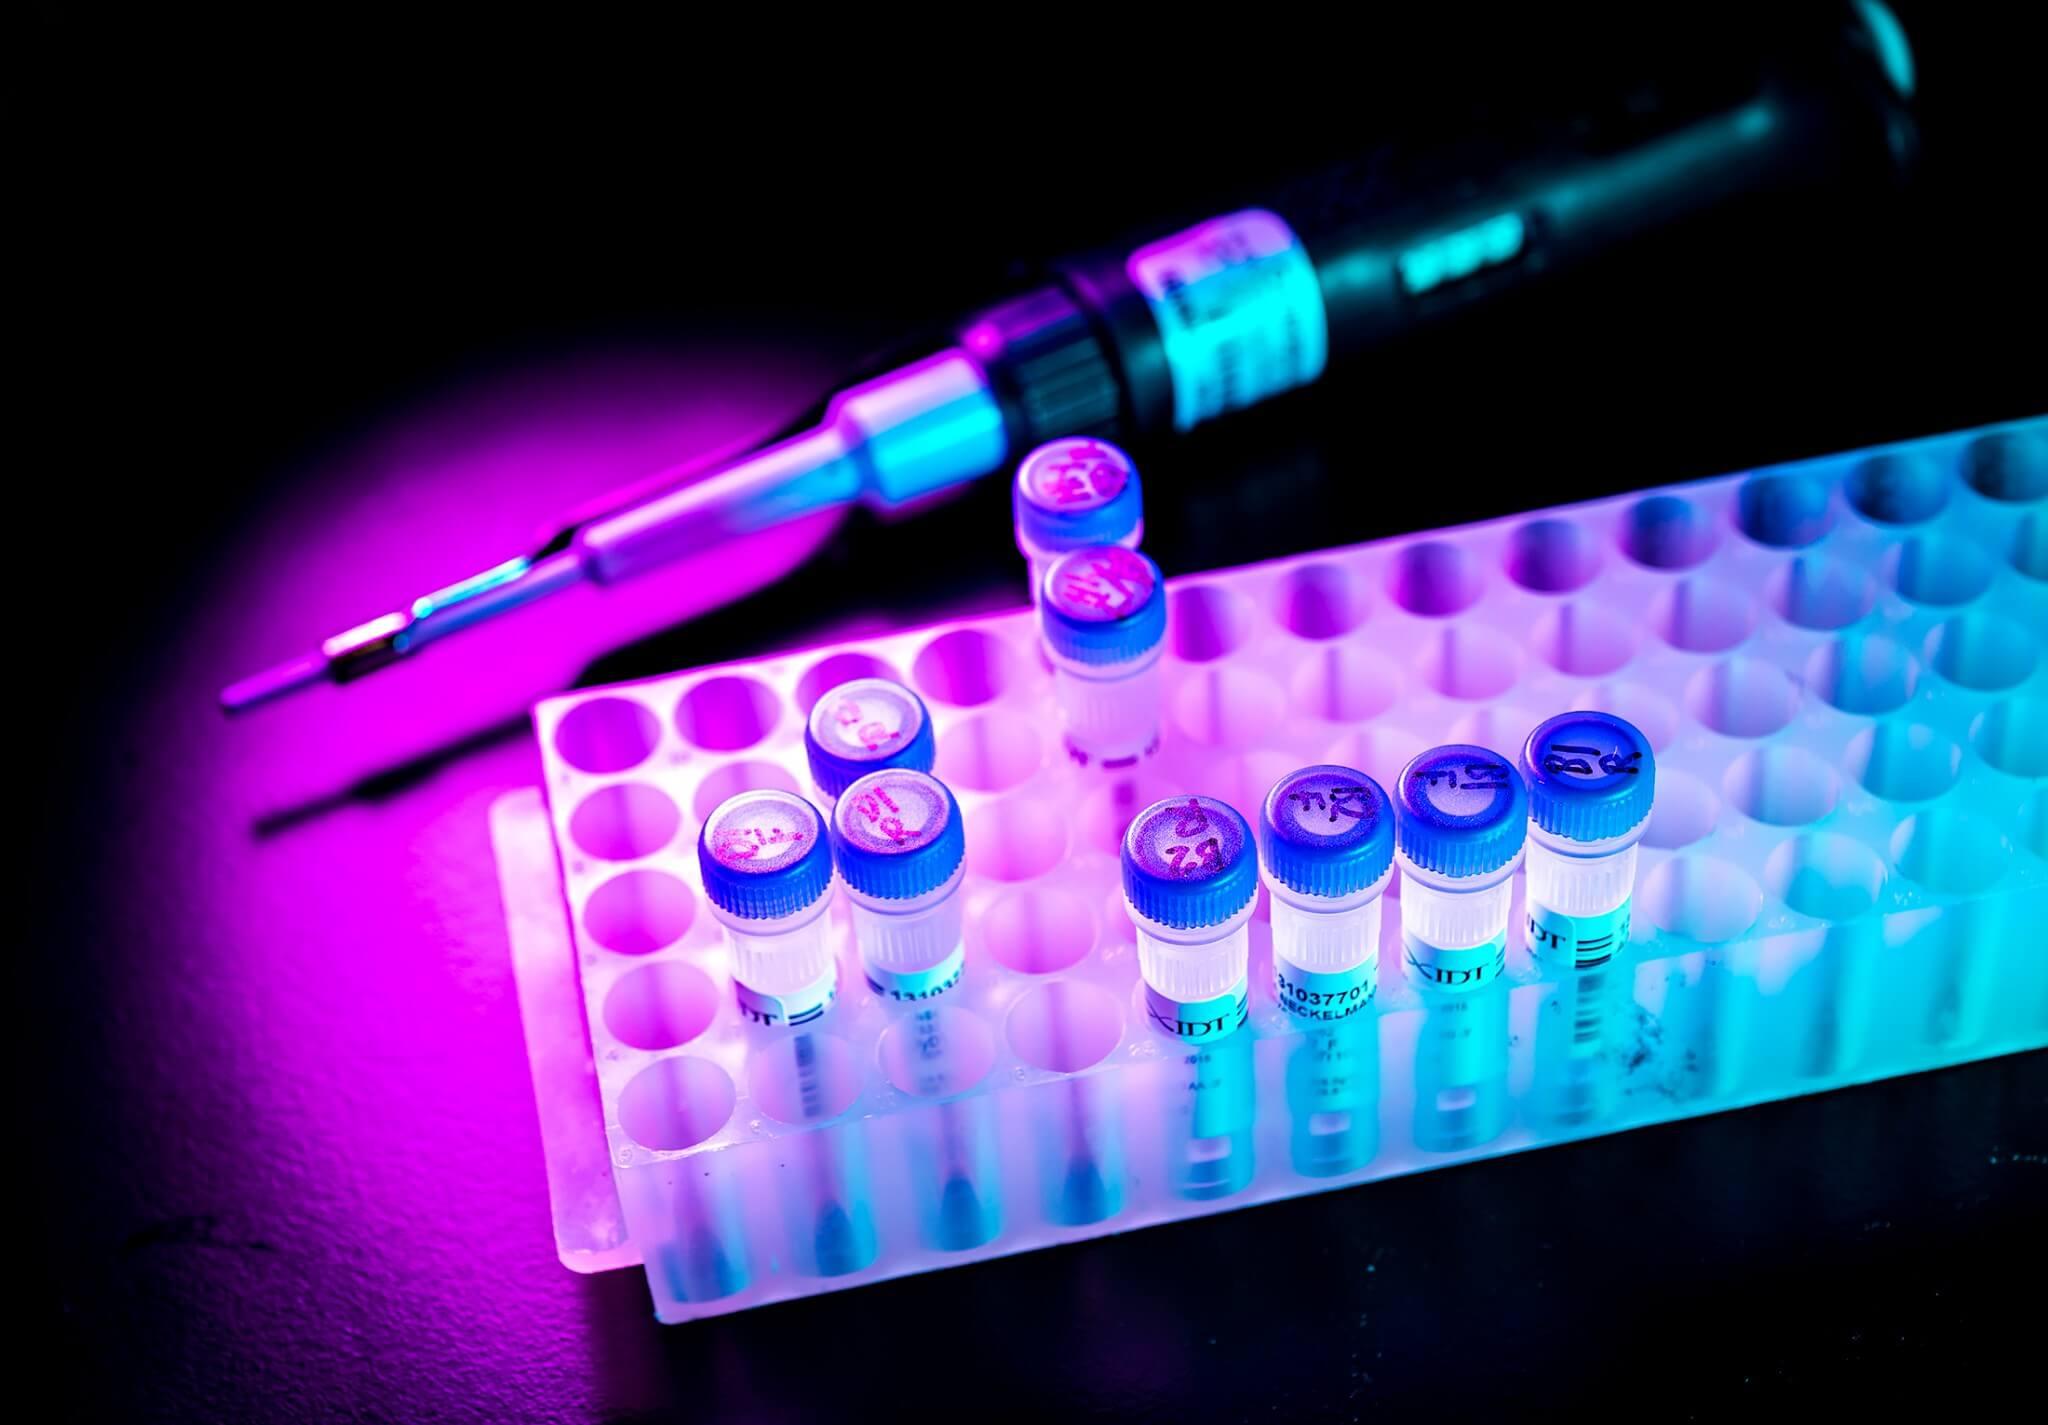 Samples of DNA in lab